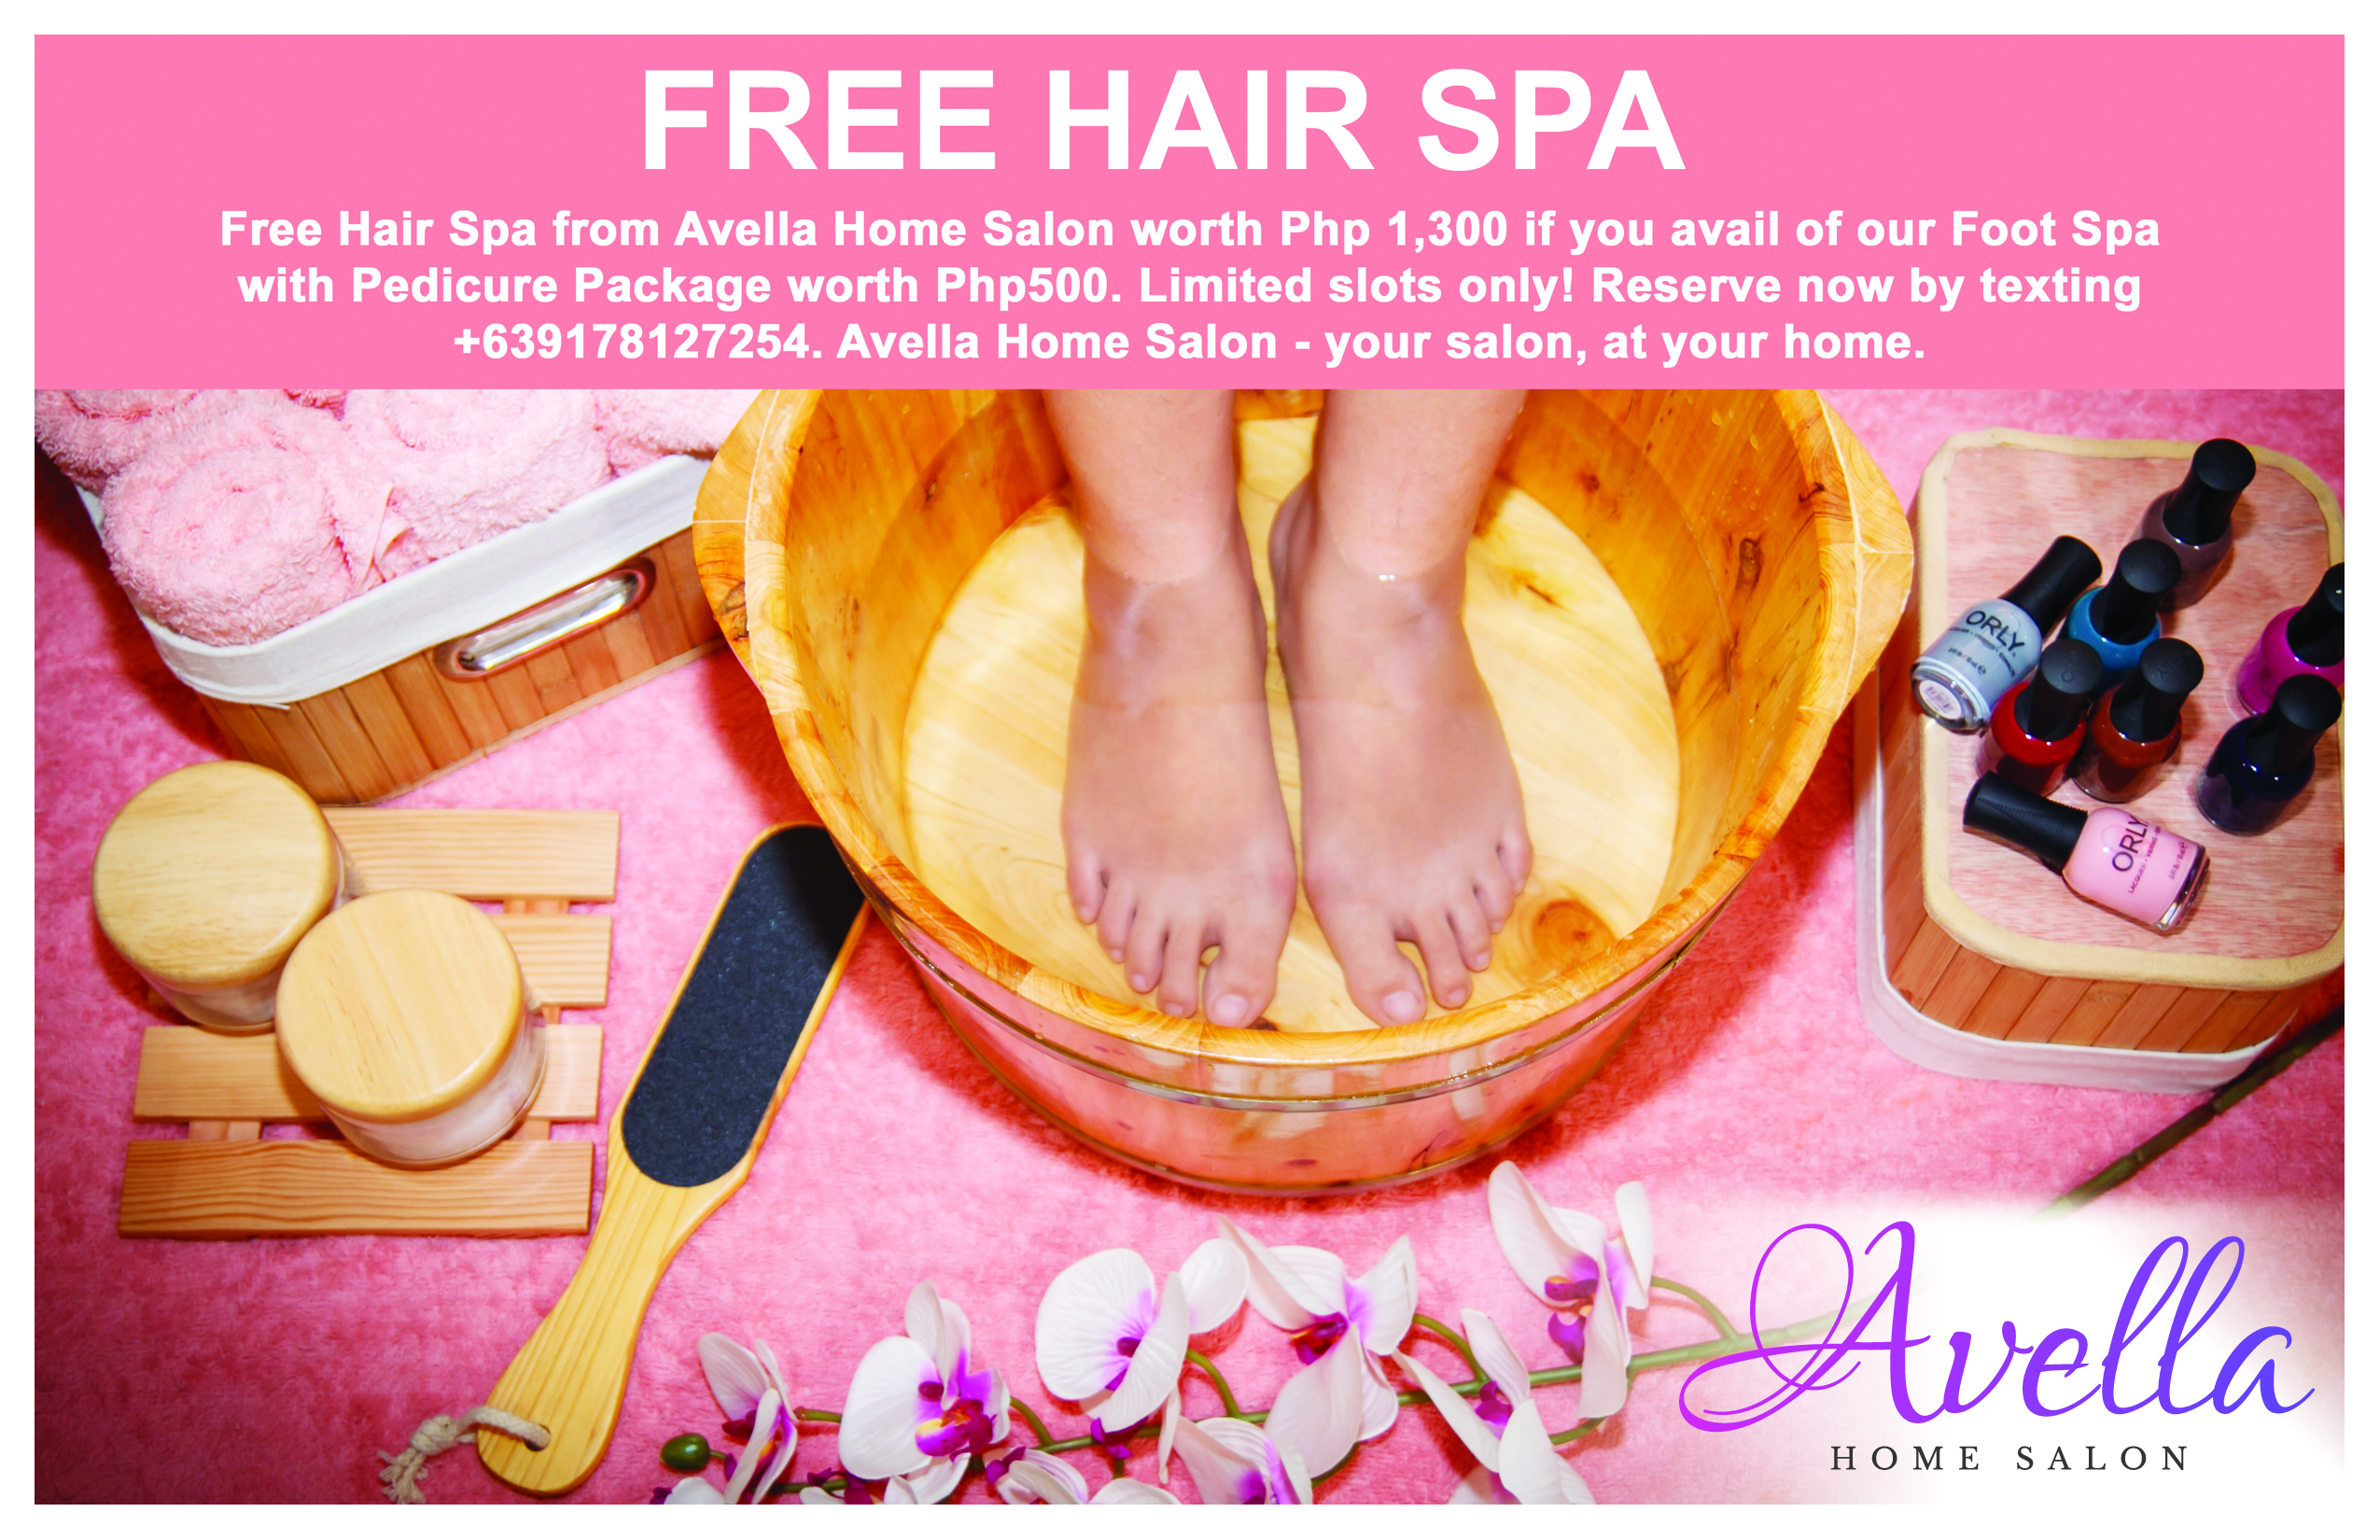 Free Hair Spa from Avella Home Salon